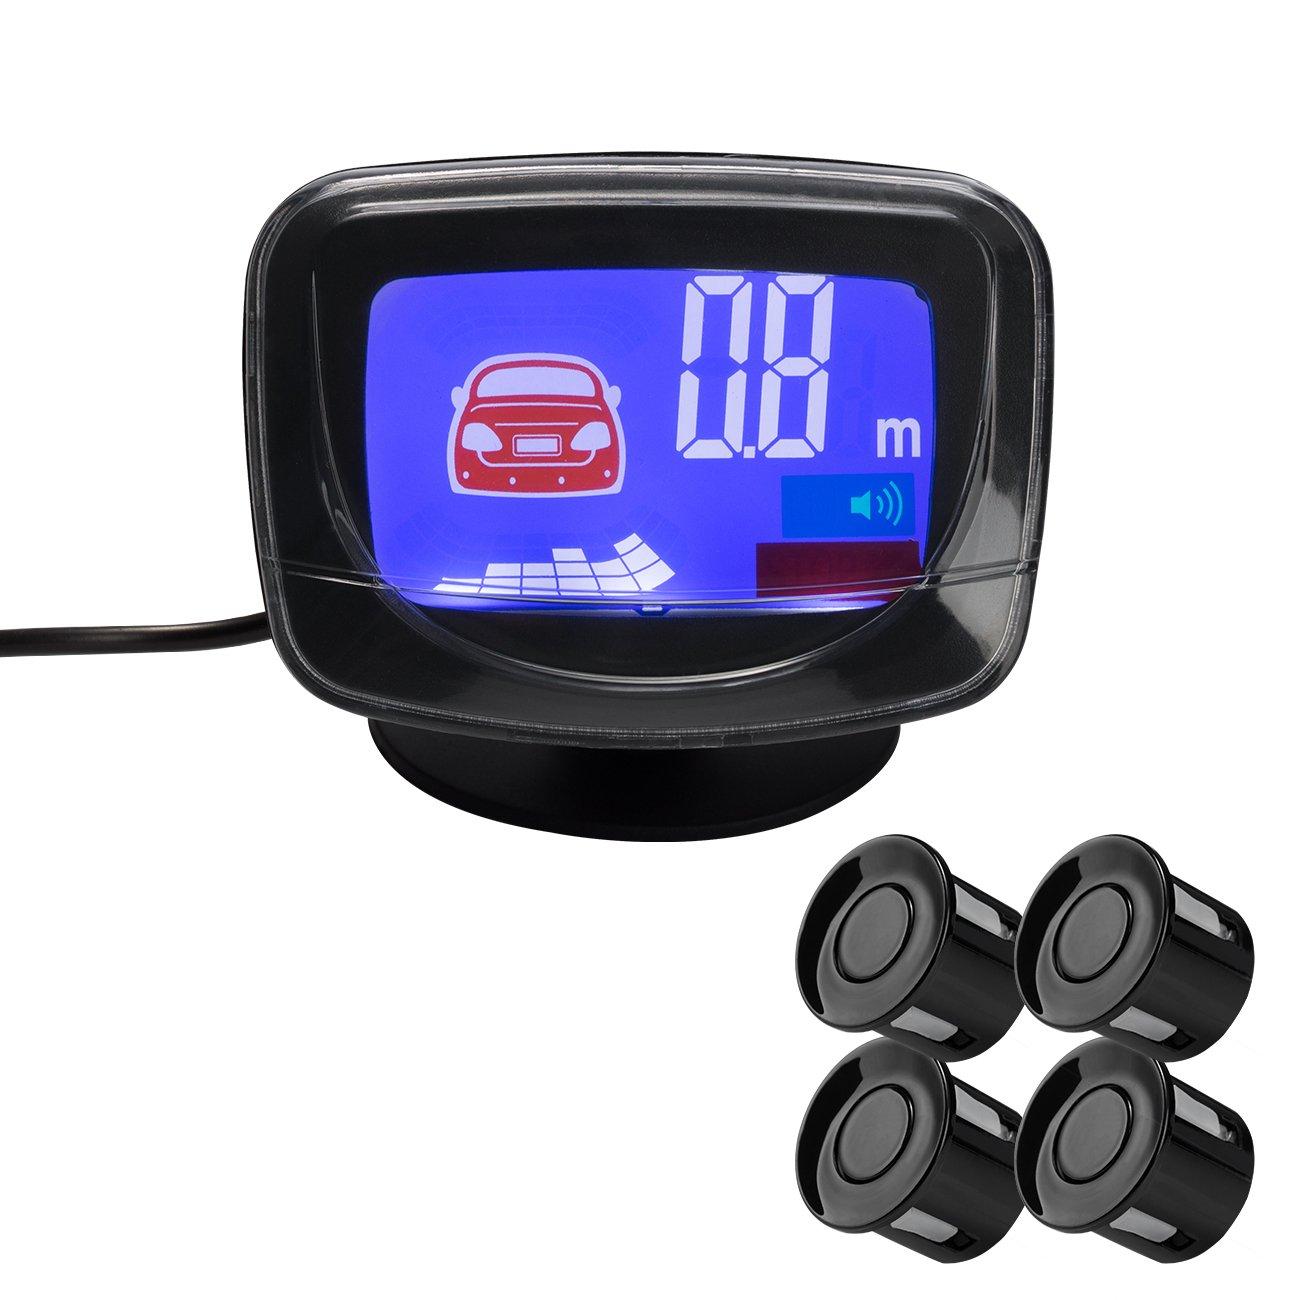 Favoto Car Parking Sensor Reversing Radar Vehicle Backup Detector System with LCD Display Warning Alarm (White) LCD-ReversingRadar-W_US